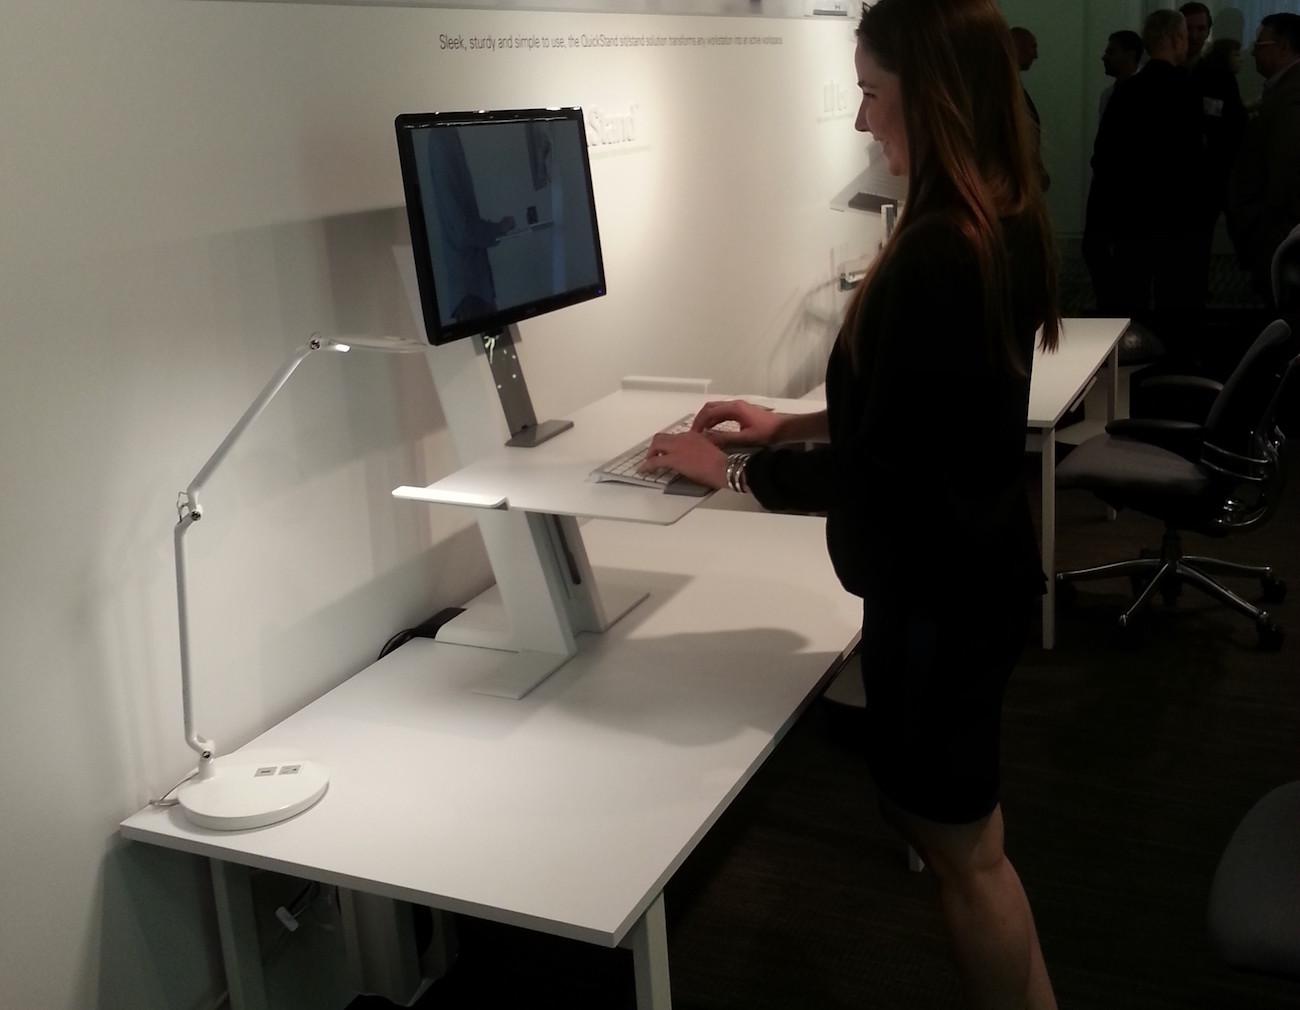 Humanscale Quickstand Light Desk Mount Review 187 The Gadget